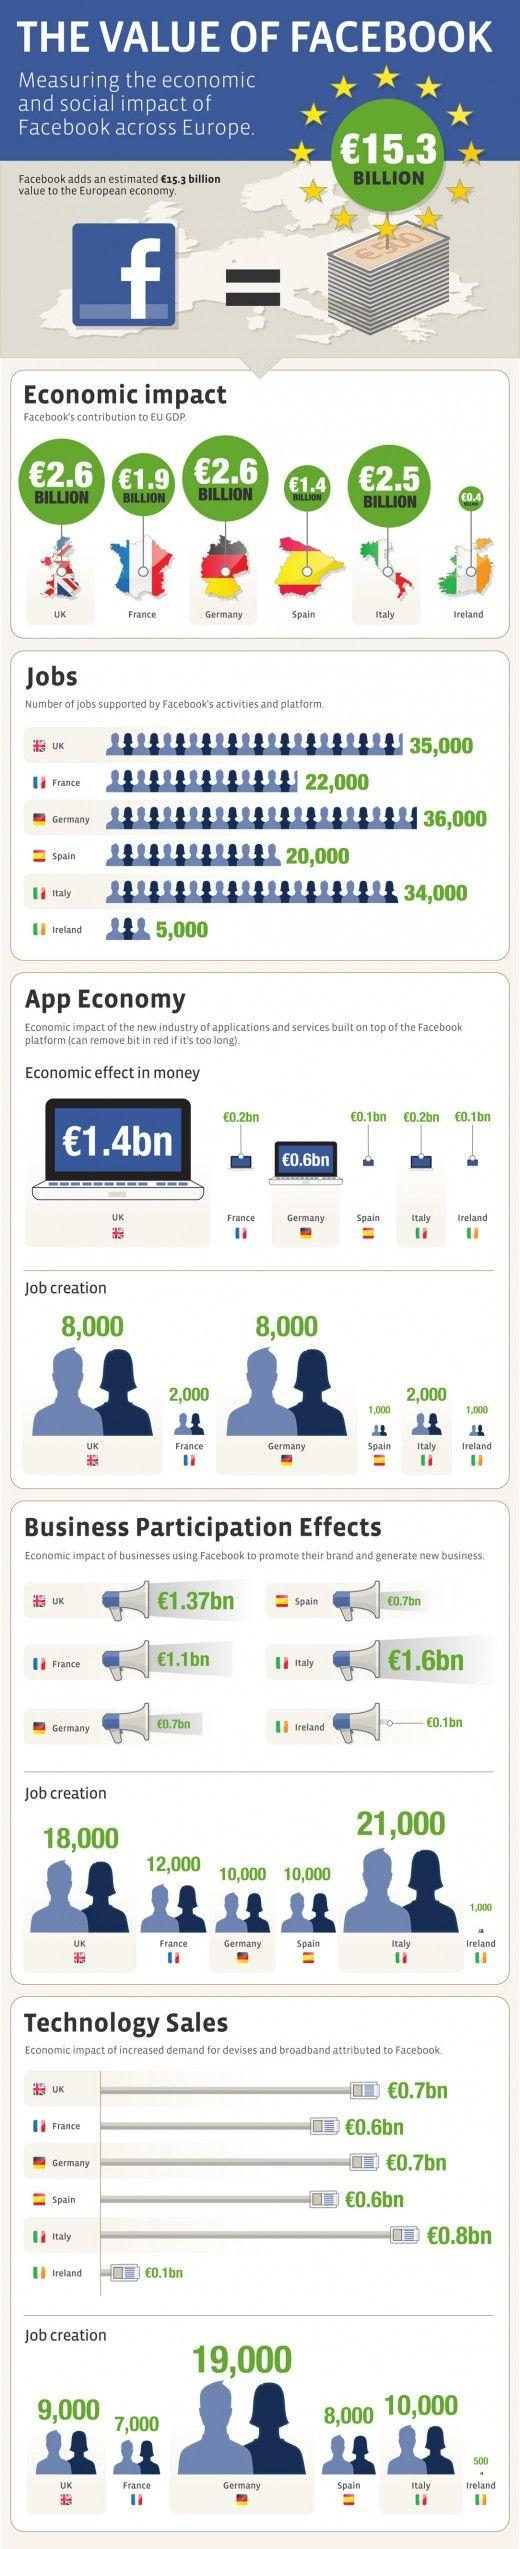 The value of Facebook in Europe #Infographic #Facebook #SocialMedia